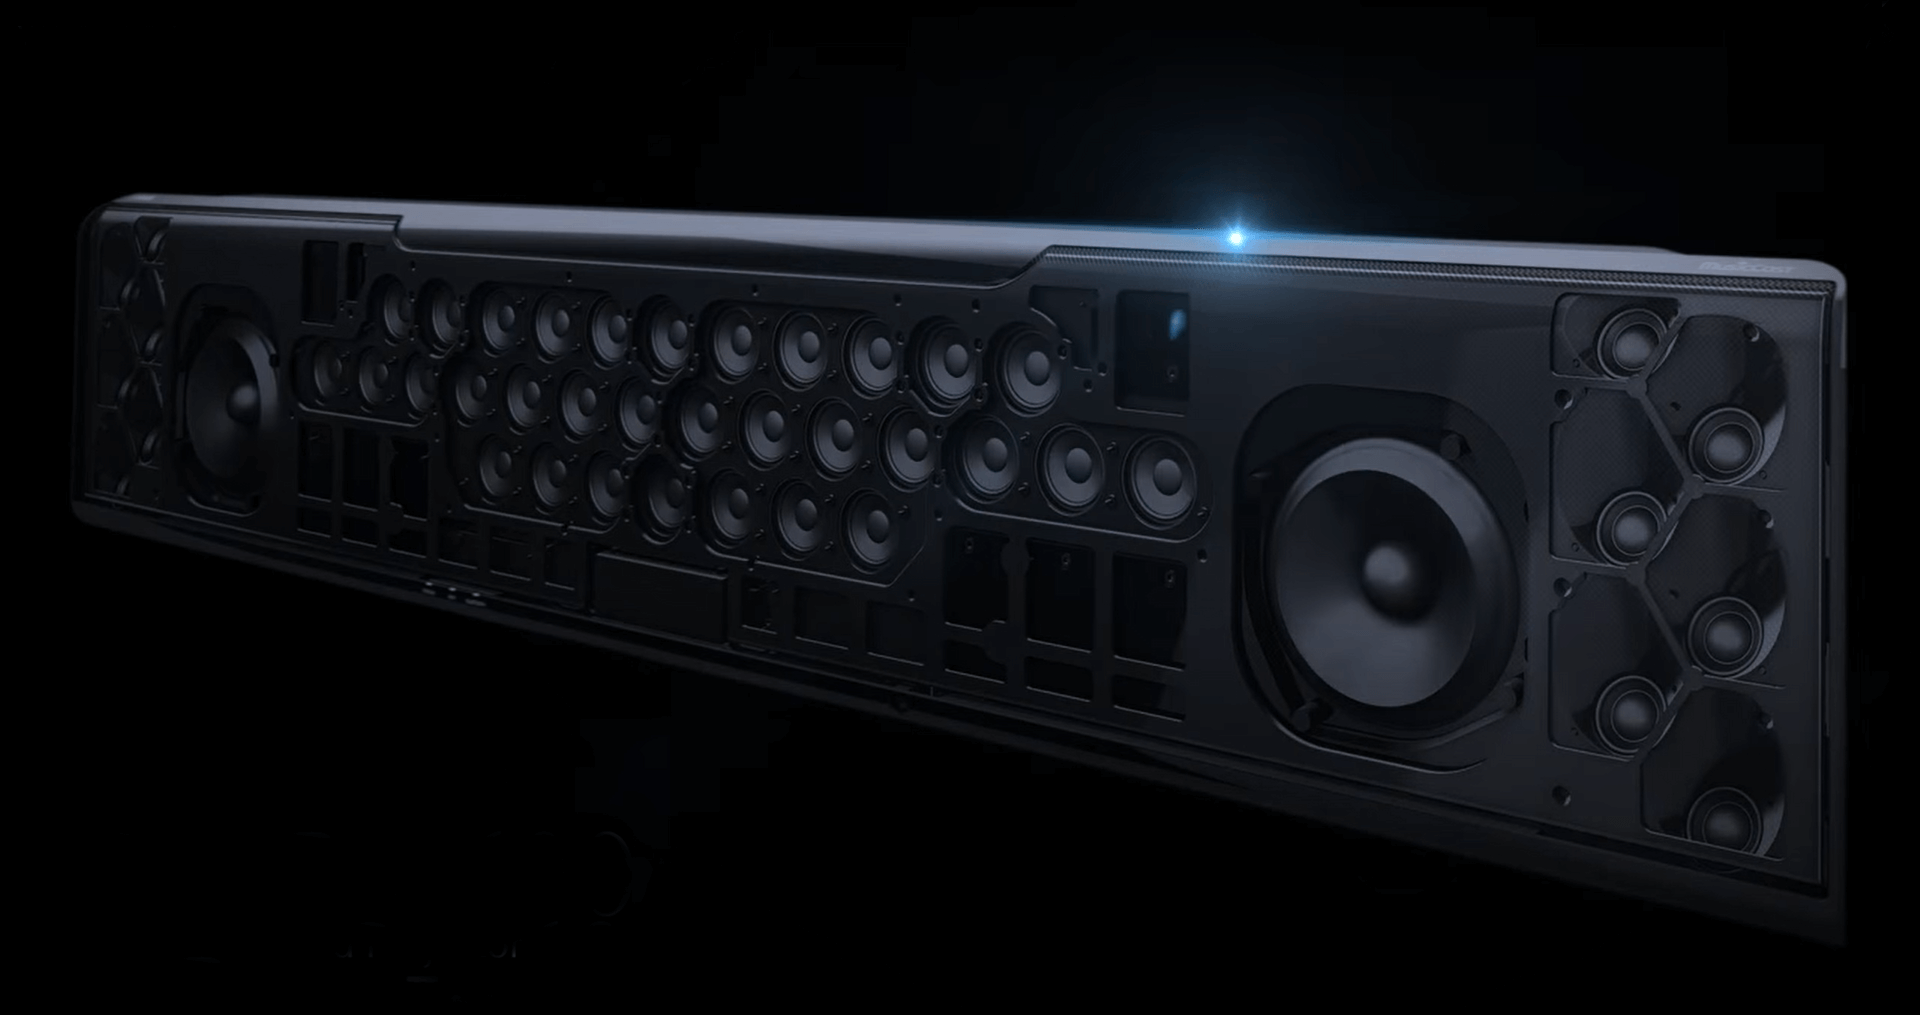 yamaha ysp 5600 soundbar finish schwarz sehr hochwertig. Black Bedroom Furniture Sets. Home Design Ideas